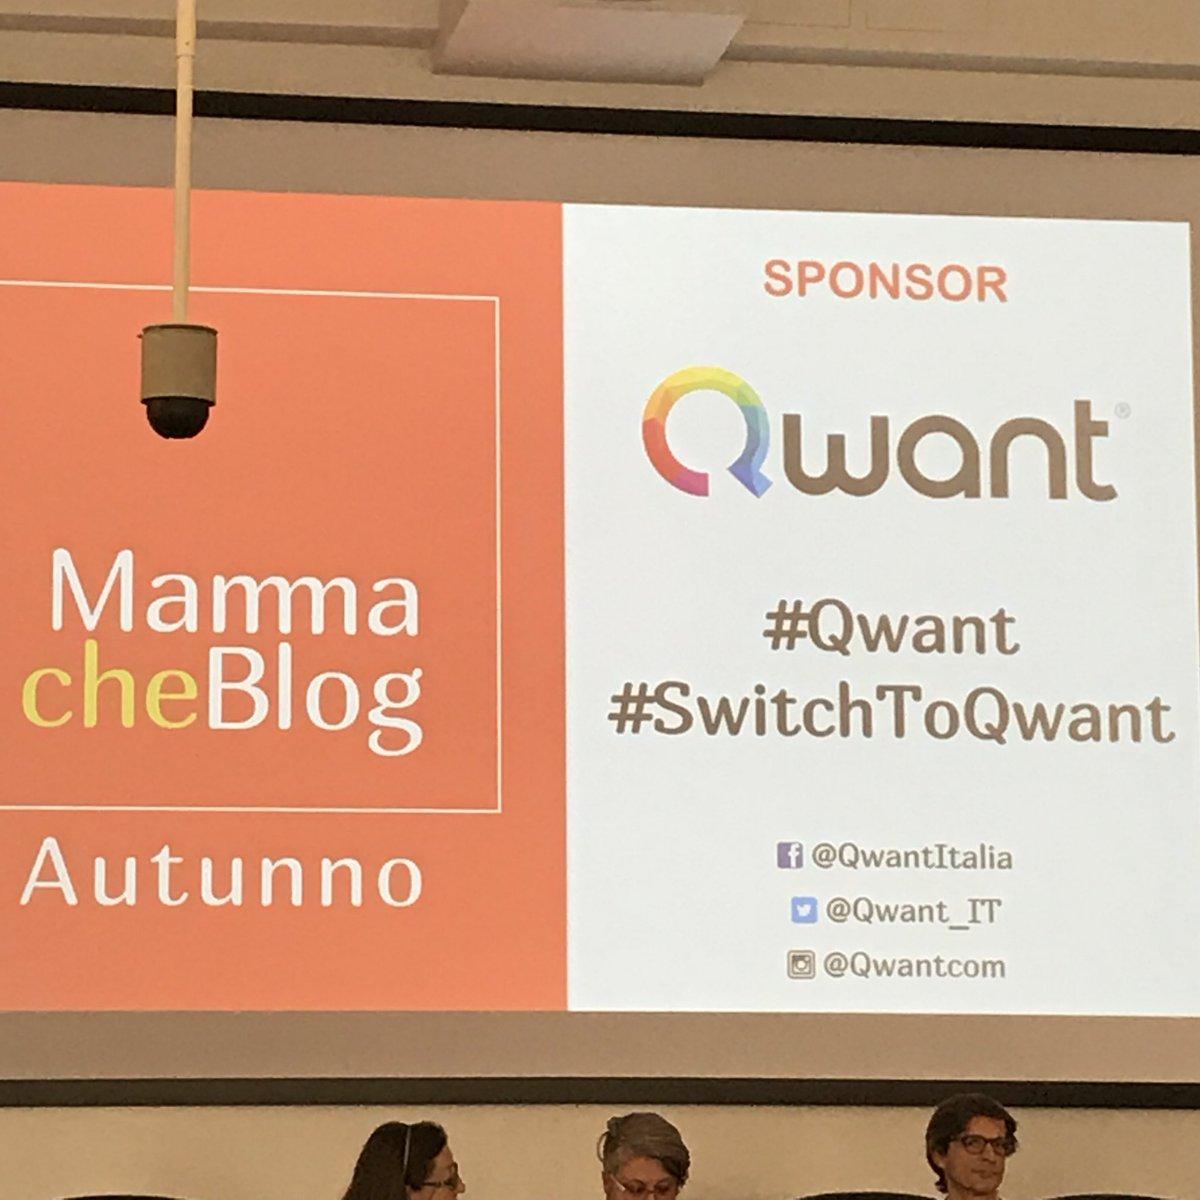 #qwant